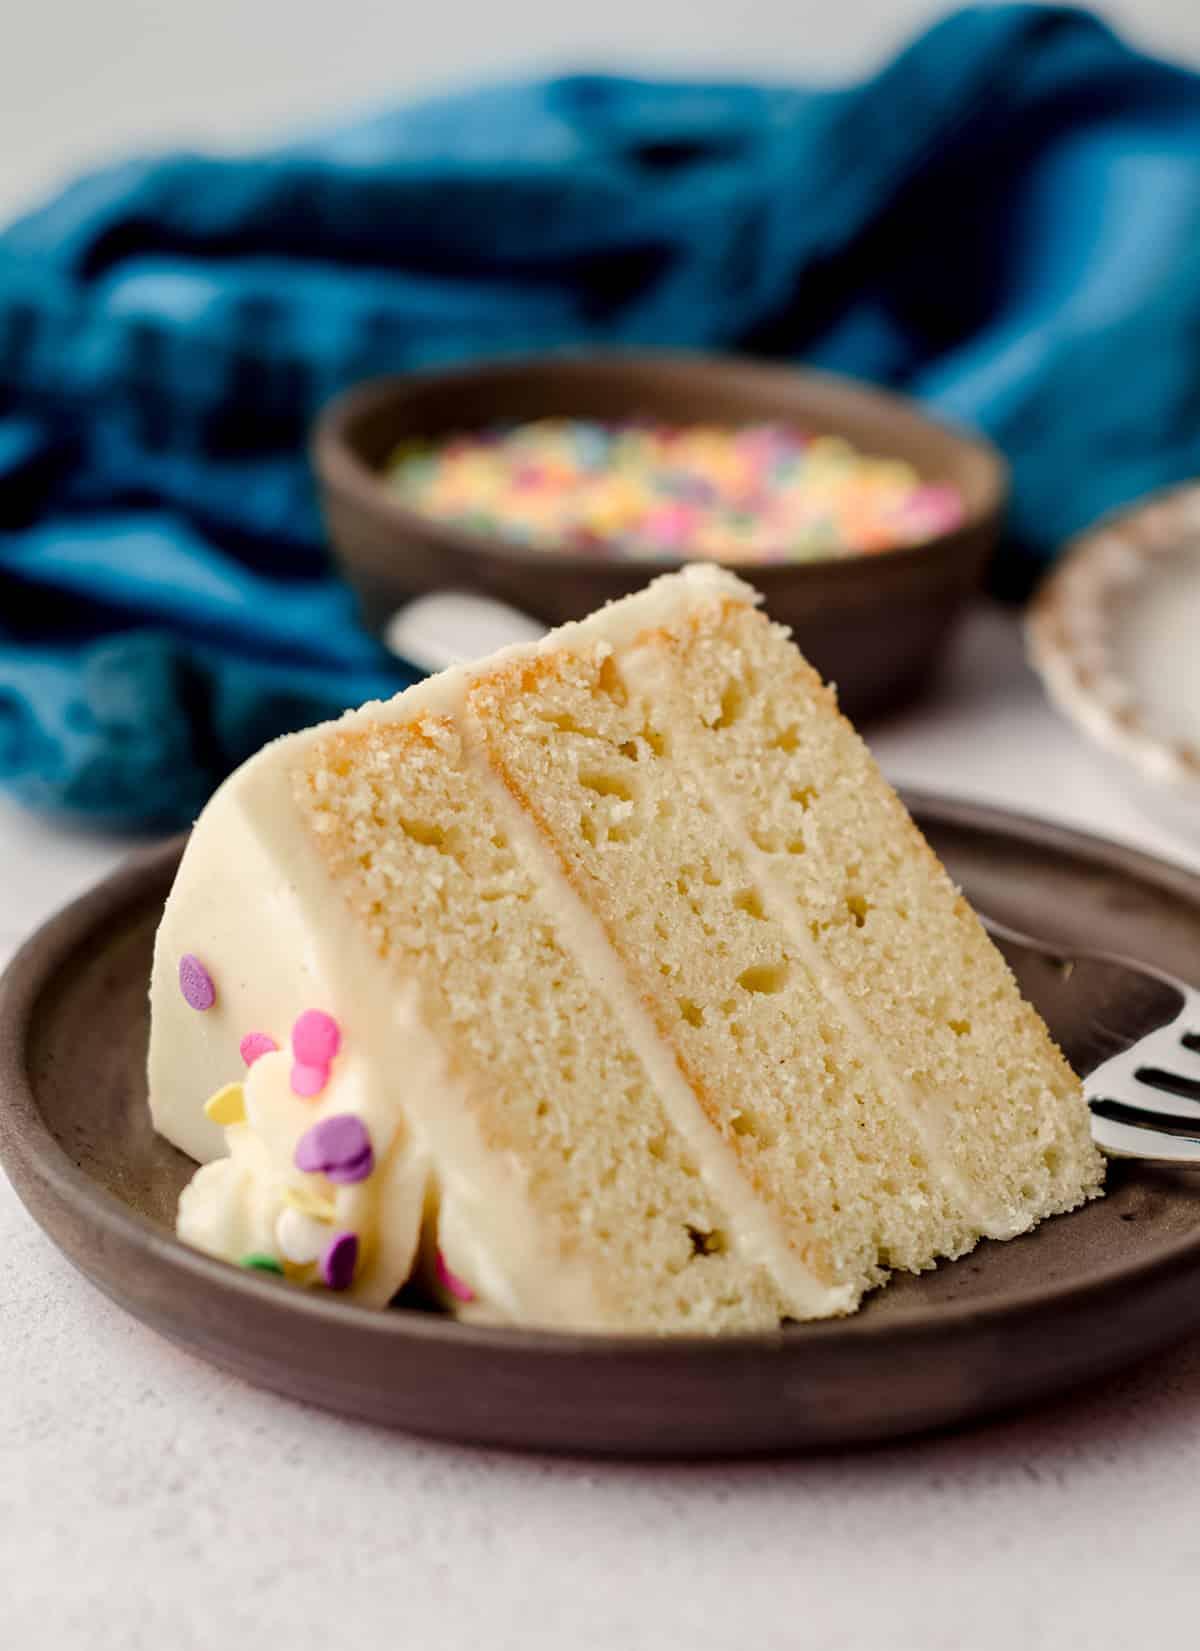 slice of vanilla cake on a plate